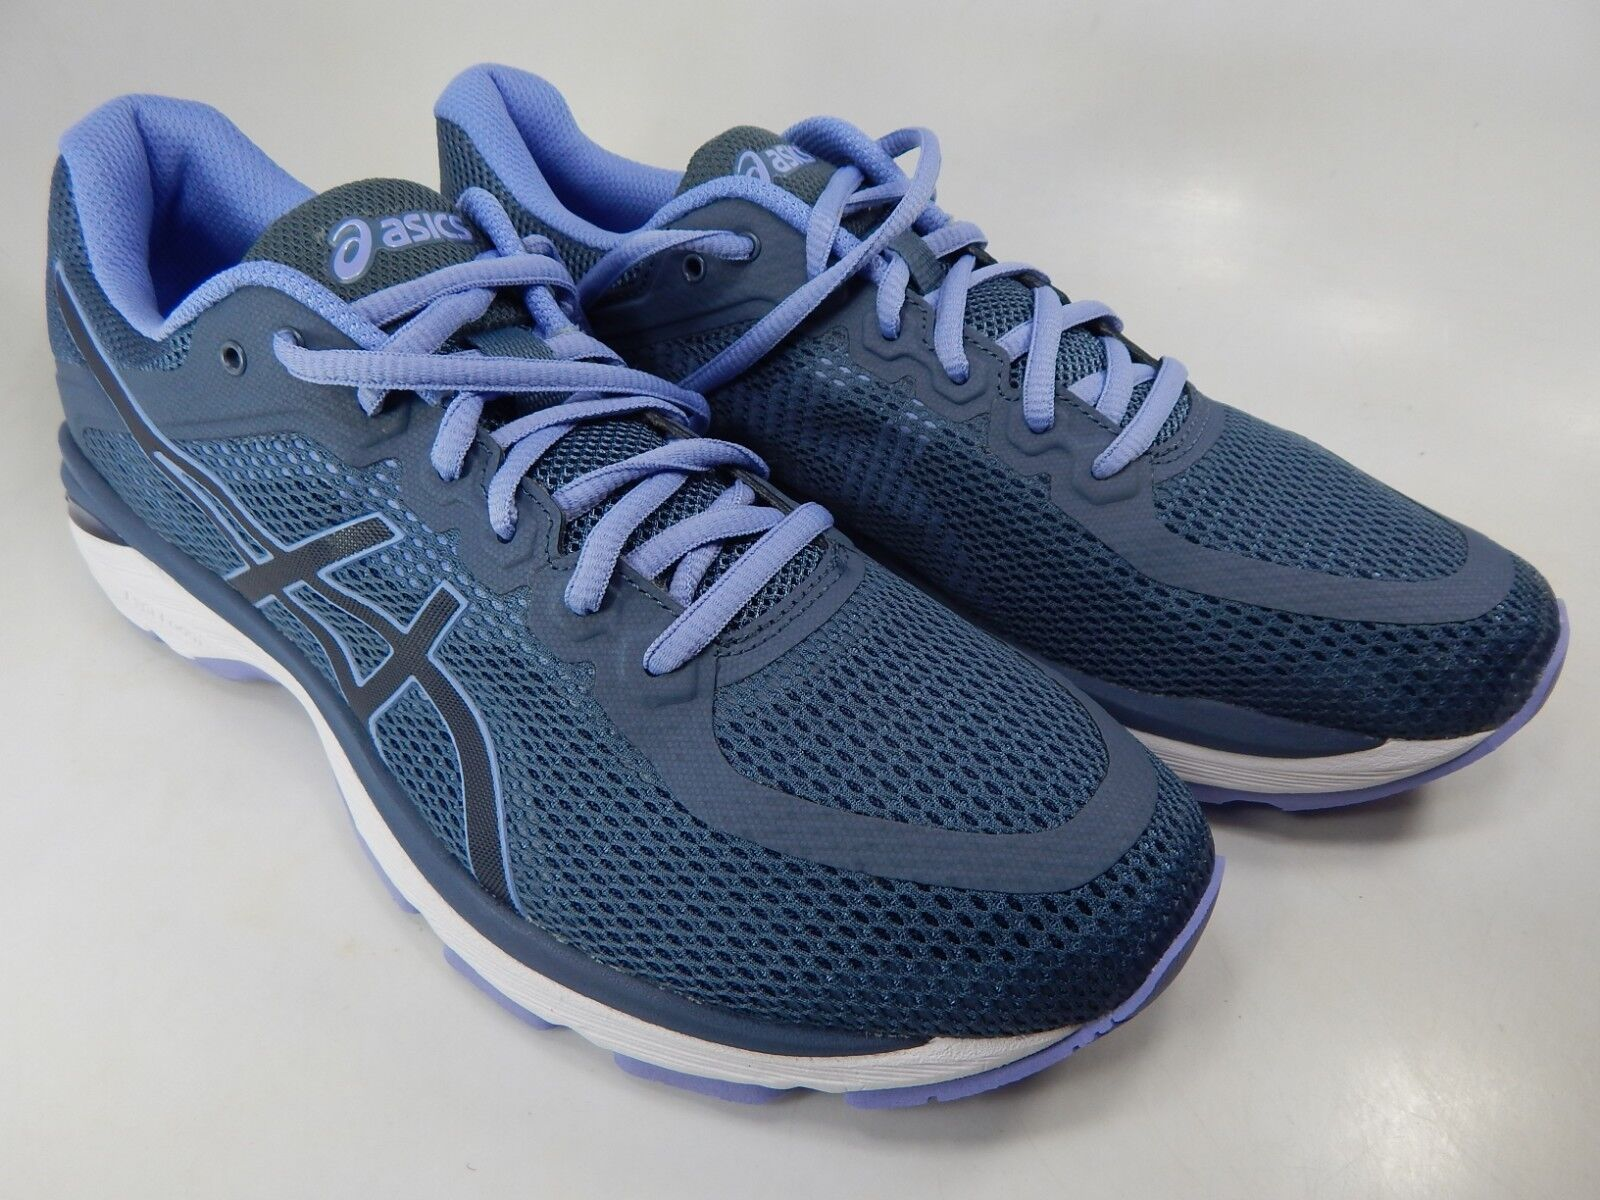 Asics Gel Pursue 4 4 4 Sz 10.5 M (B) EU 42.5 Women's Running shoes Purple bluee T859N 475b8b